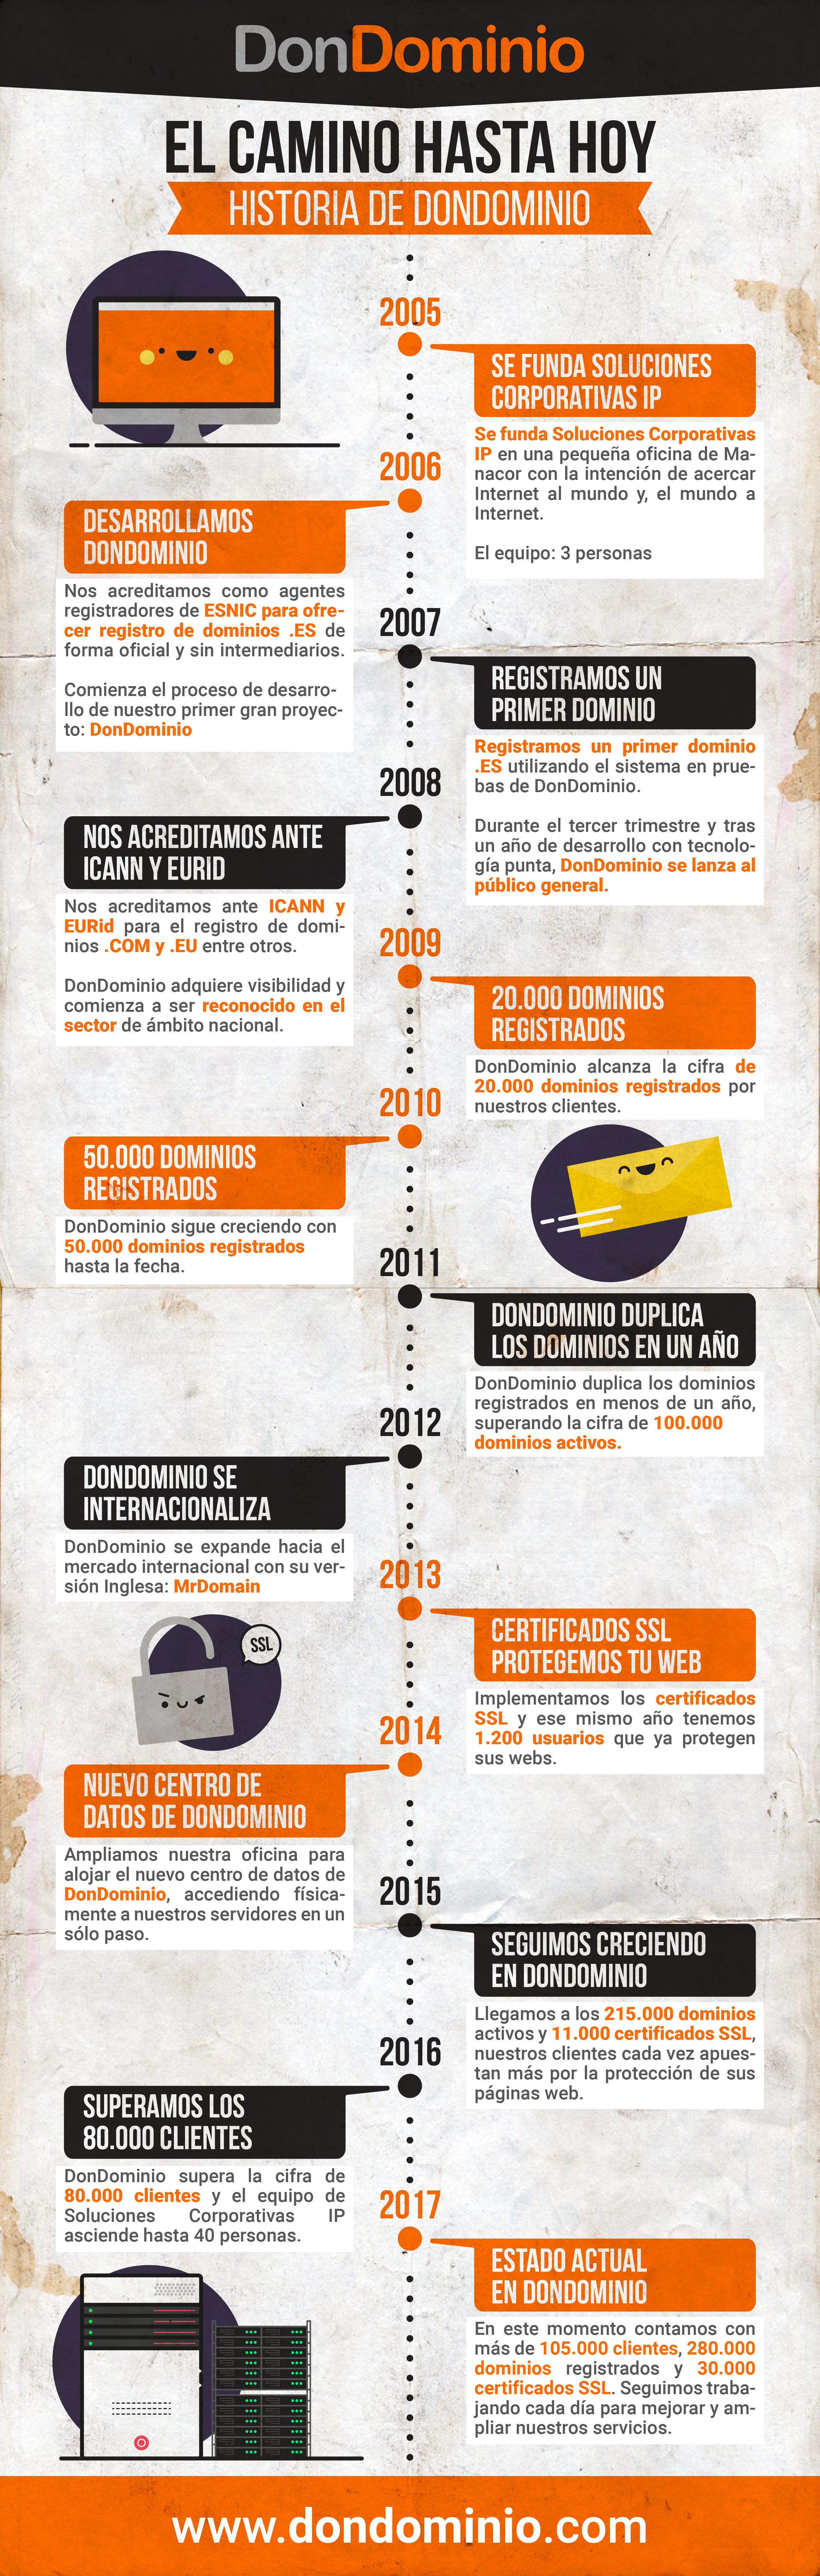 La historia de DonDominio